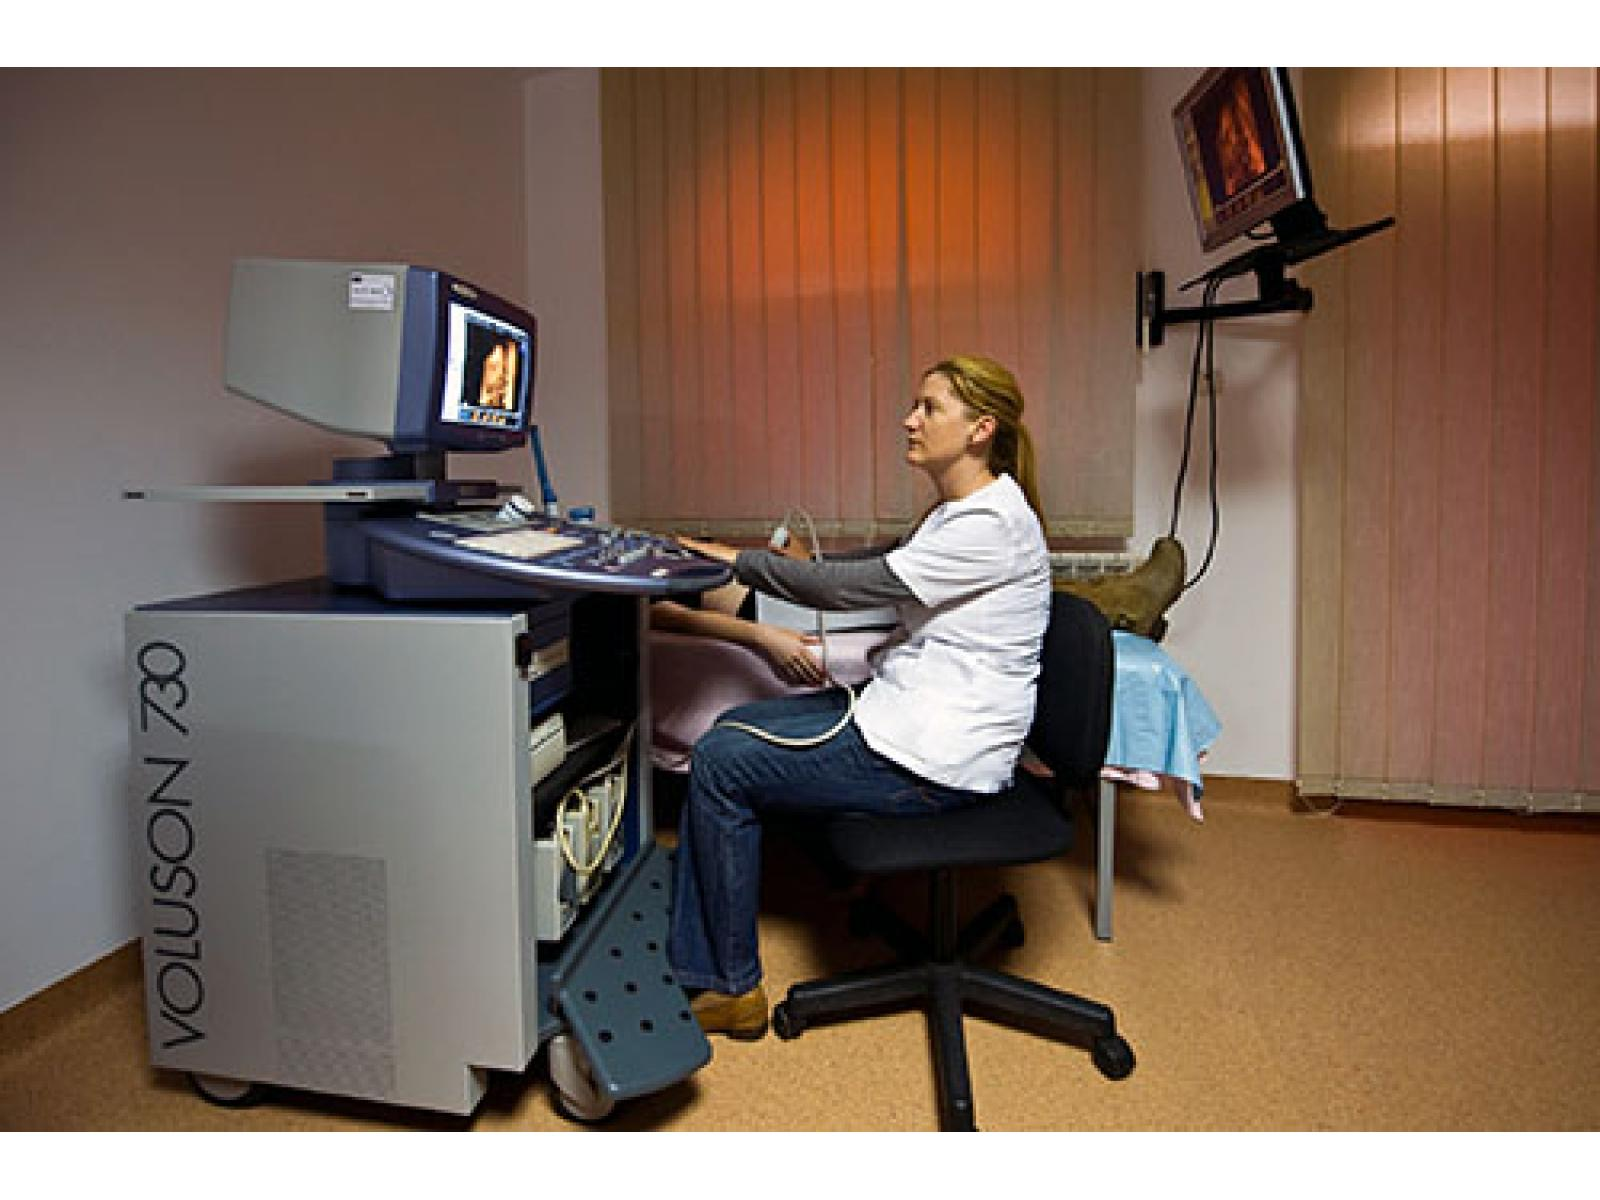 Centrul Medical Promed System Targoviste - 152_vuluson.jpg